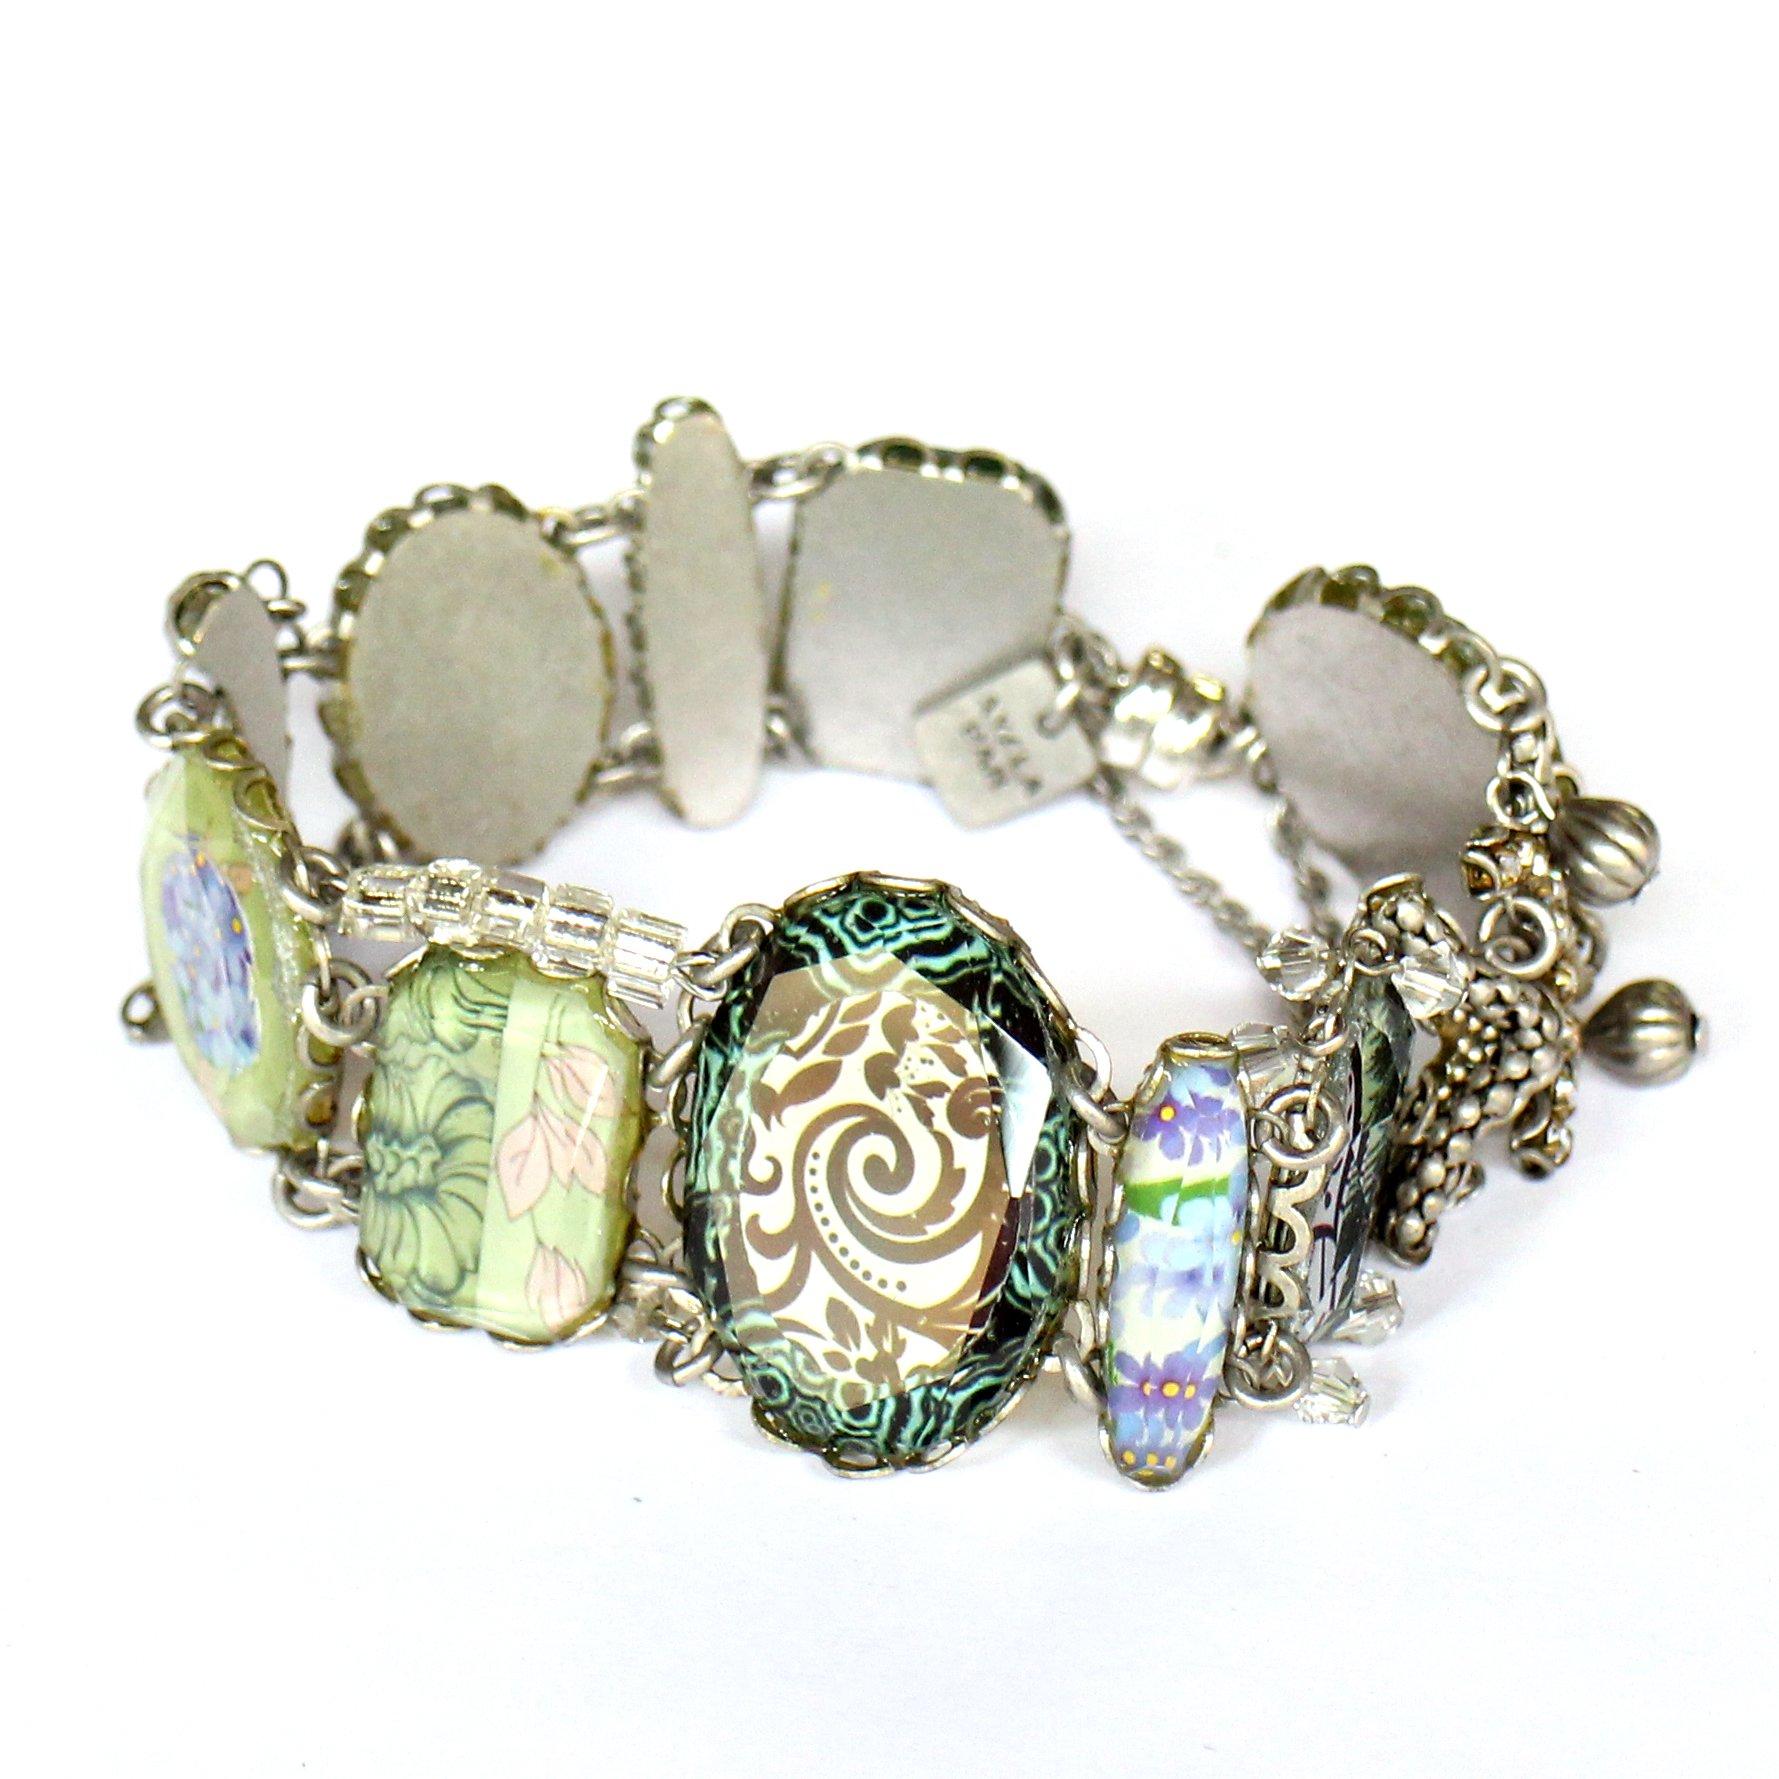 Ayala Bar Radiance Collection Collection Bracelet ay02-0337